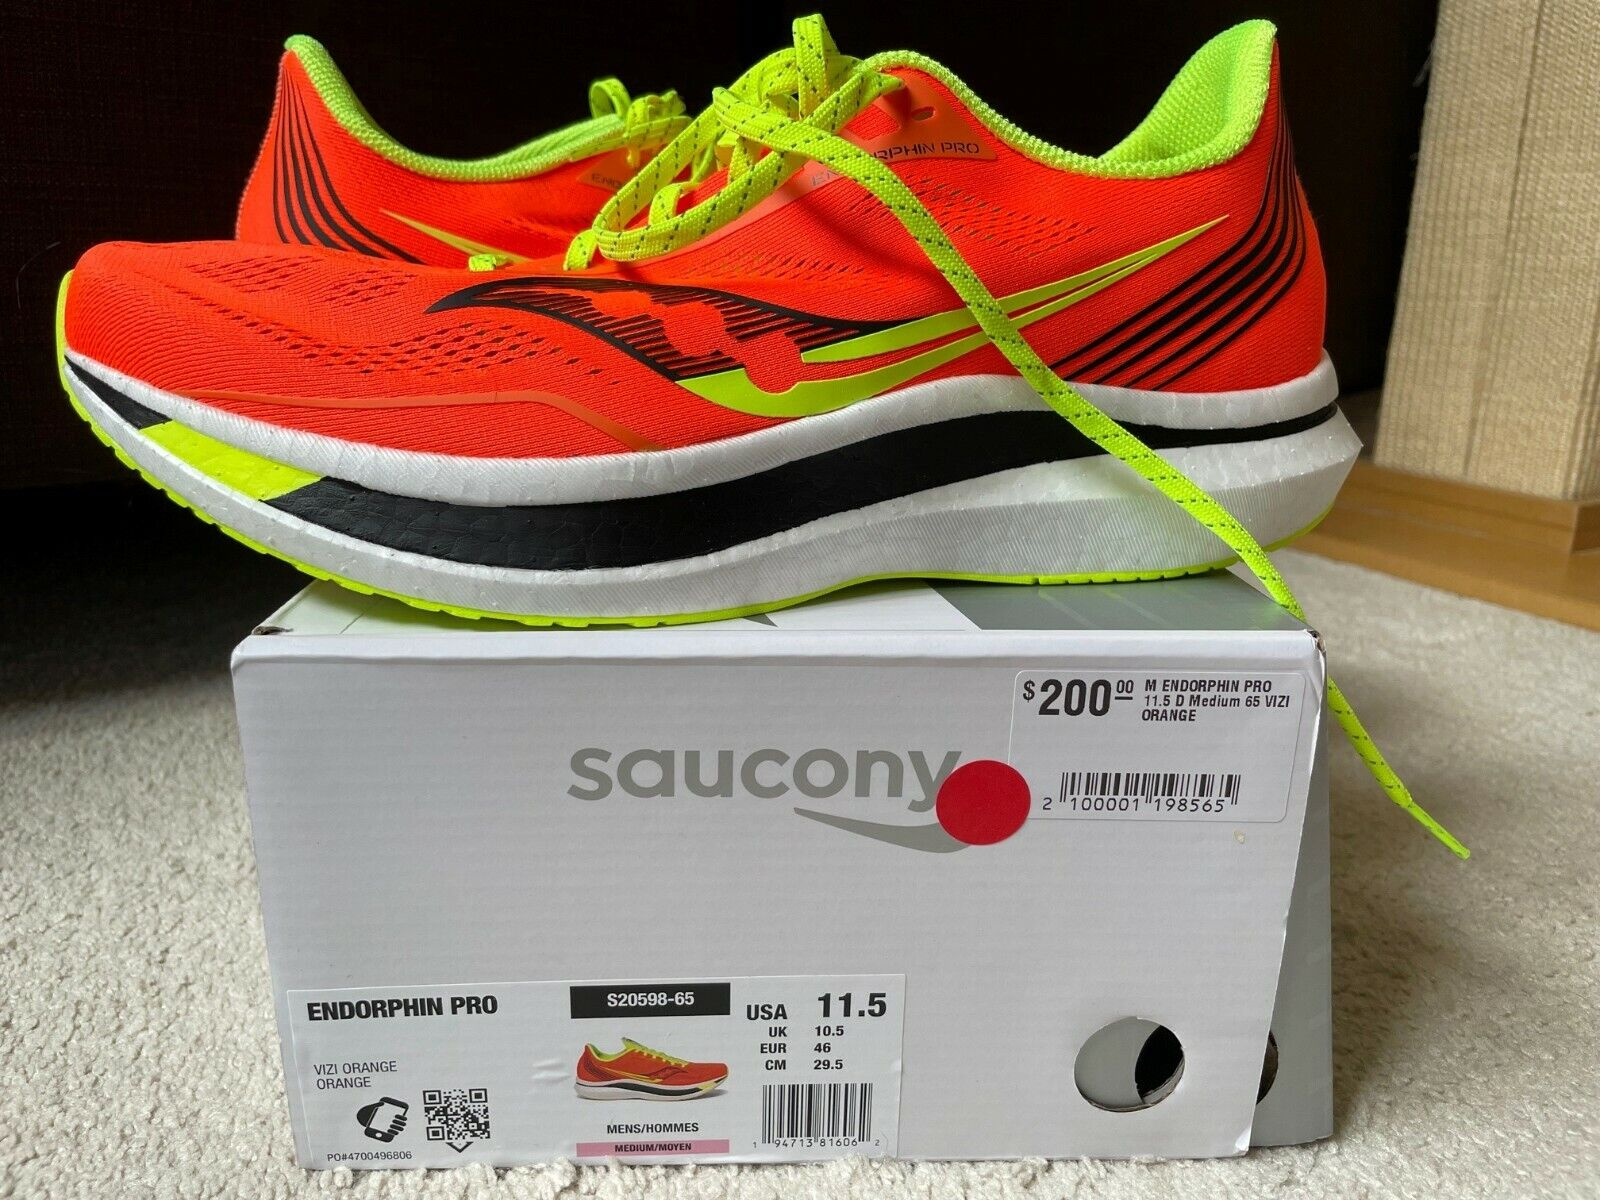 Saucony Endorphin Pro Men's Running, Size 11.5 (EUR 46) New in Box, Viz Orange